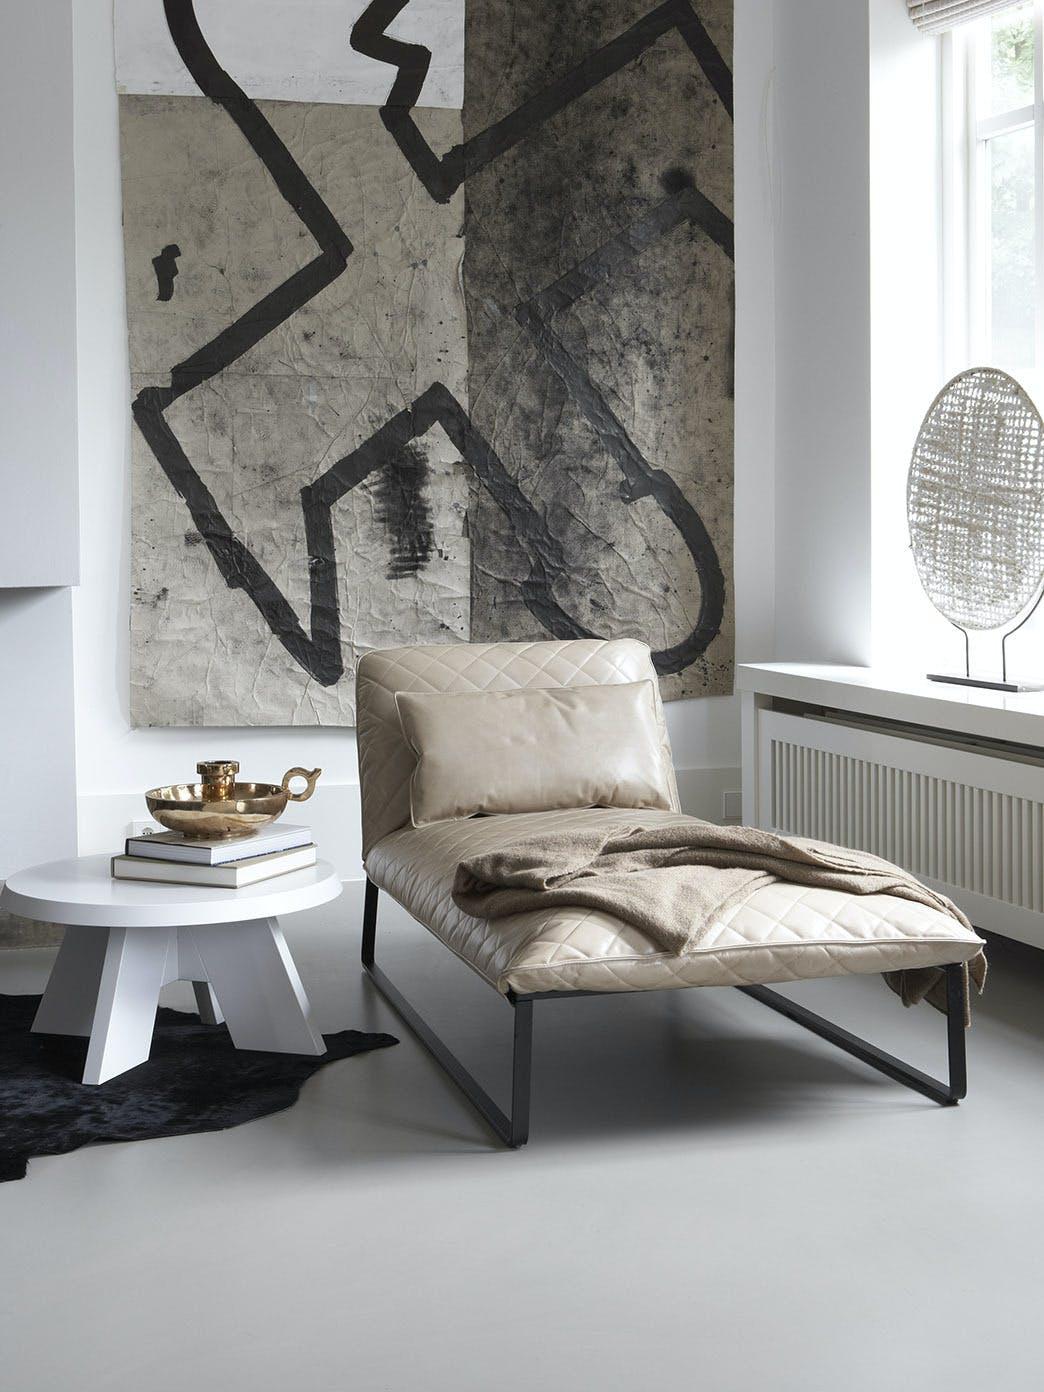 Product Design Living Nl Writer Studio Kekke Longchair Itske Coffee Table Rp Tall